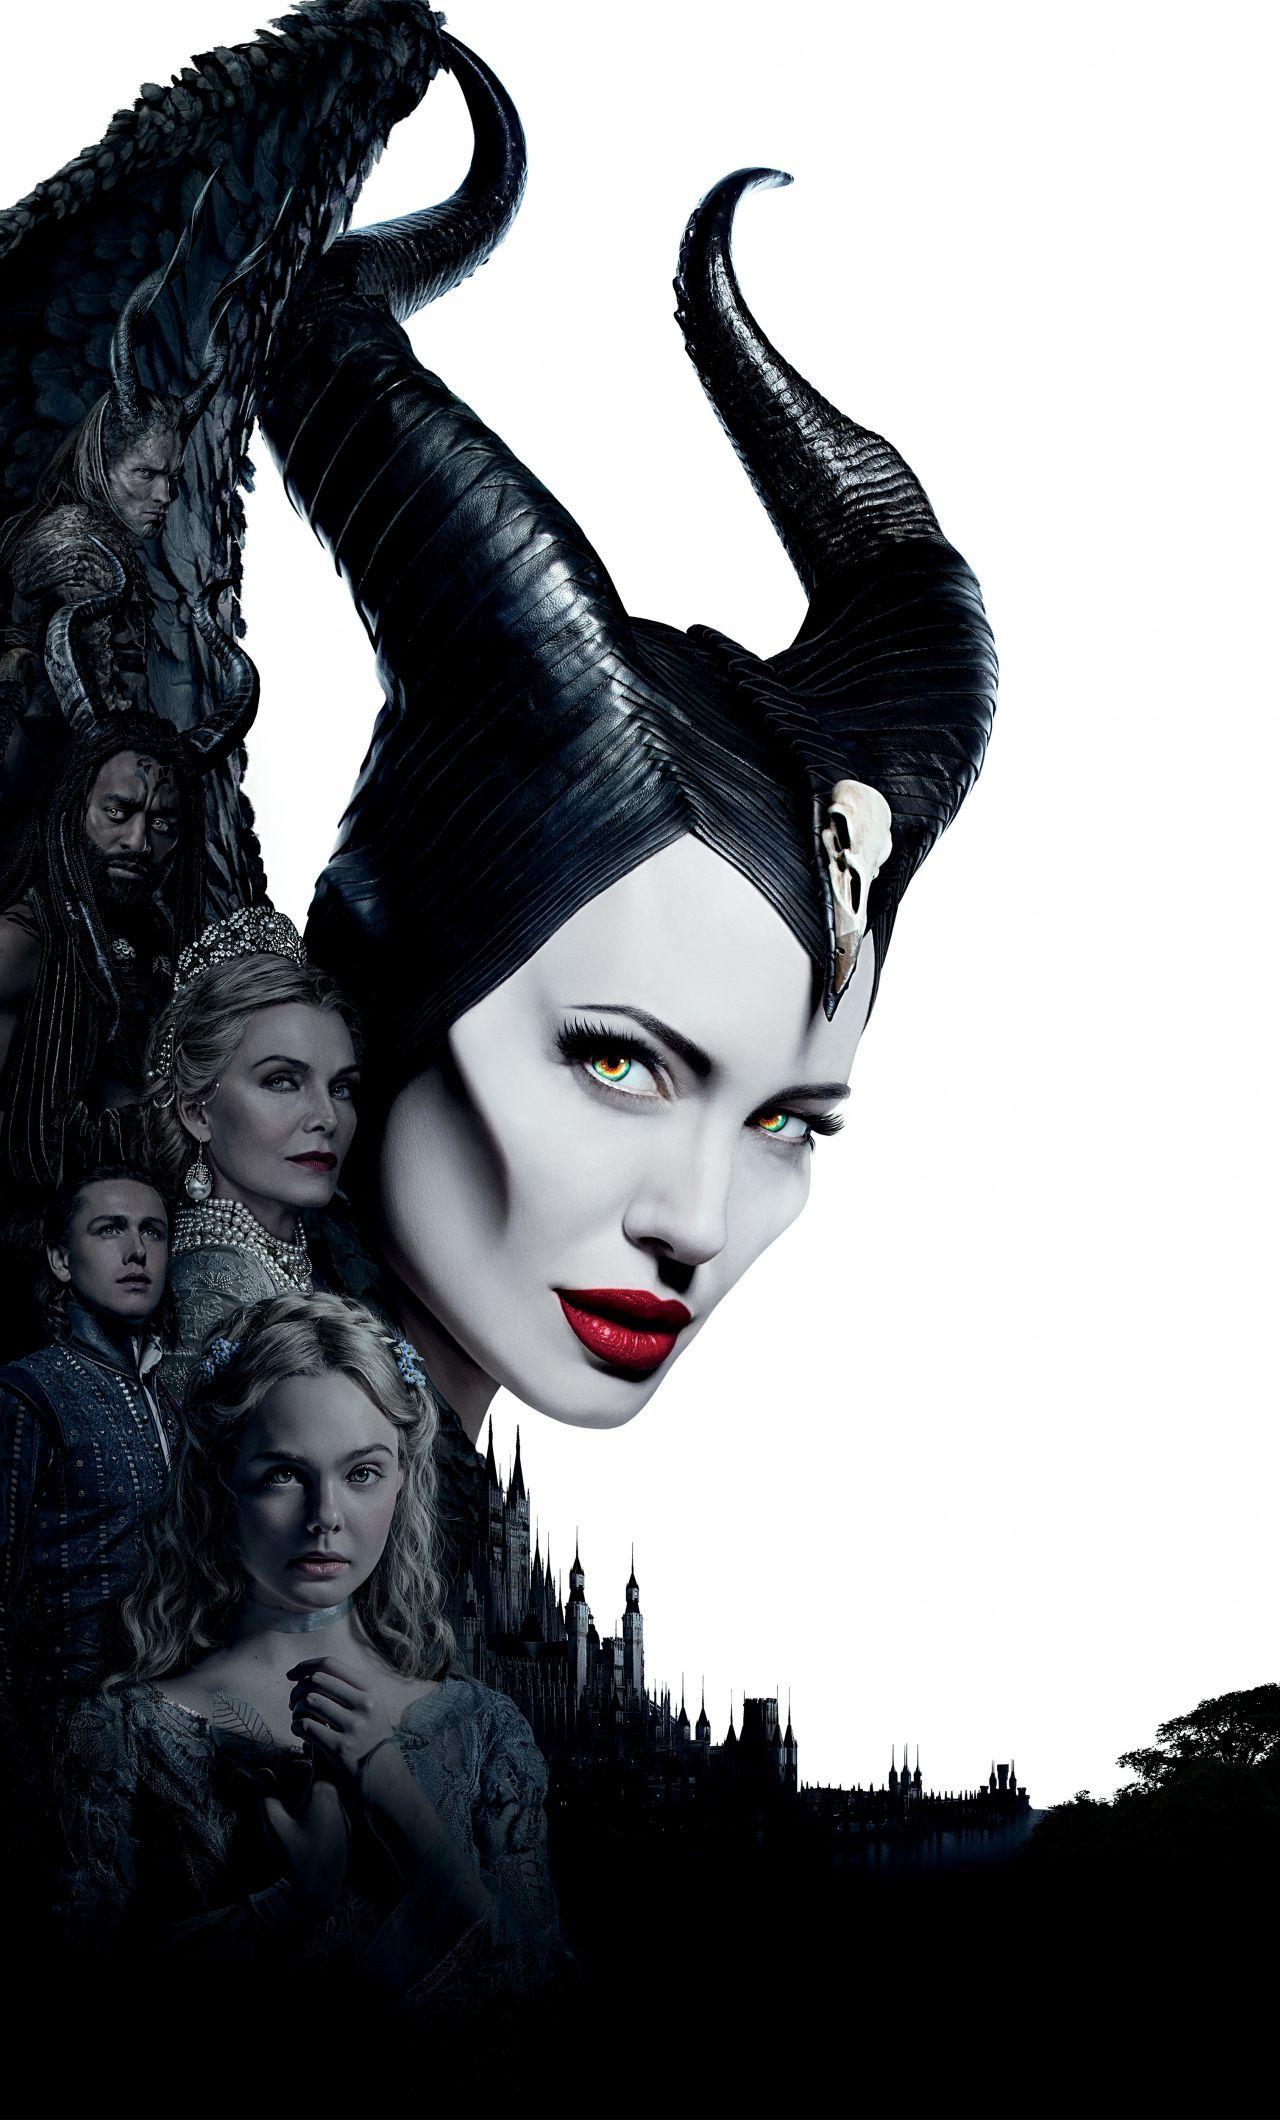 1280x2120 Maleficent Mistress Of Evil Movie Poster 2019